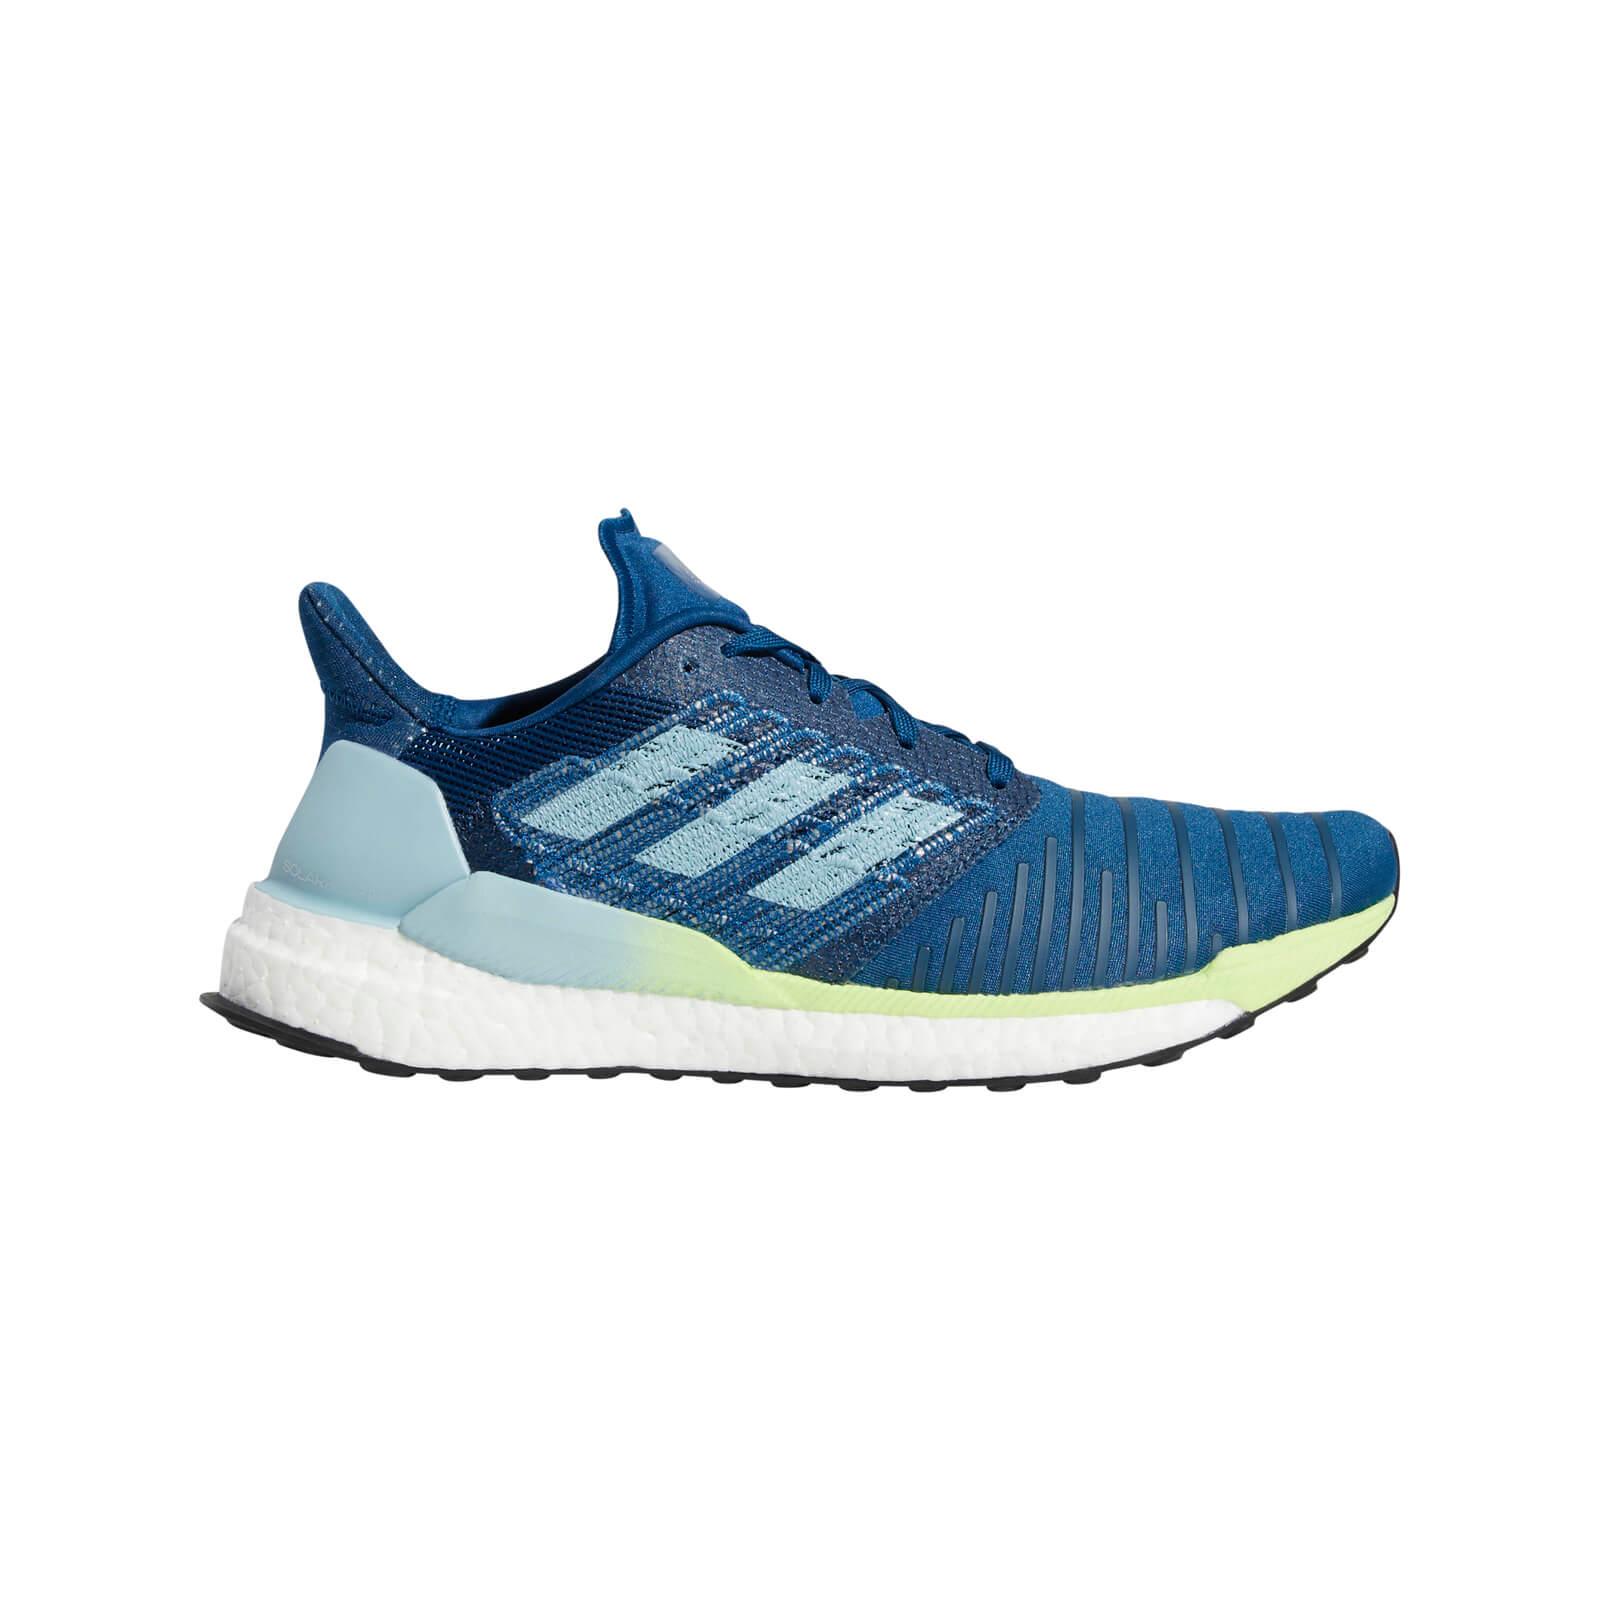 adidas Men's Solar Boost Running Shoes - Blue - US 8/UK 7.5 - Blue